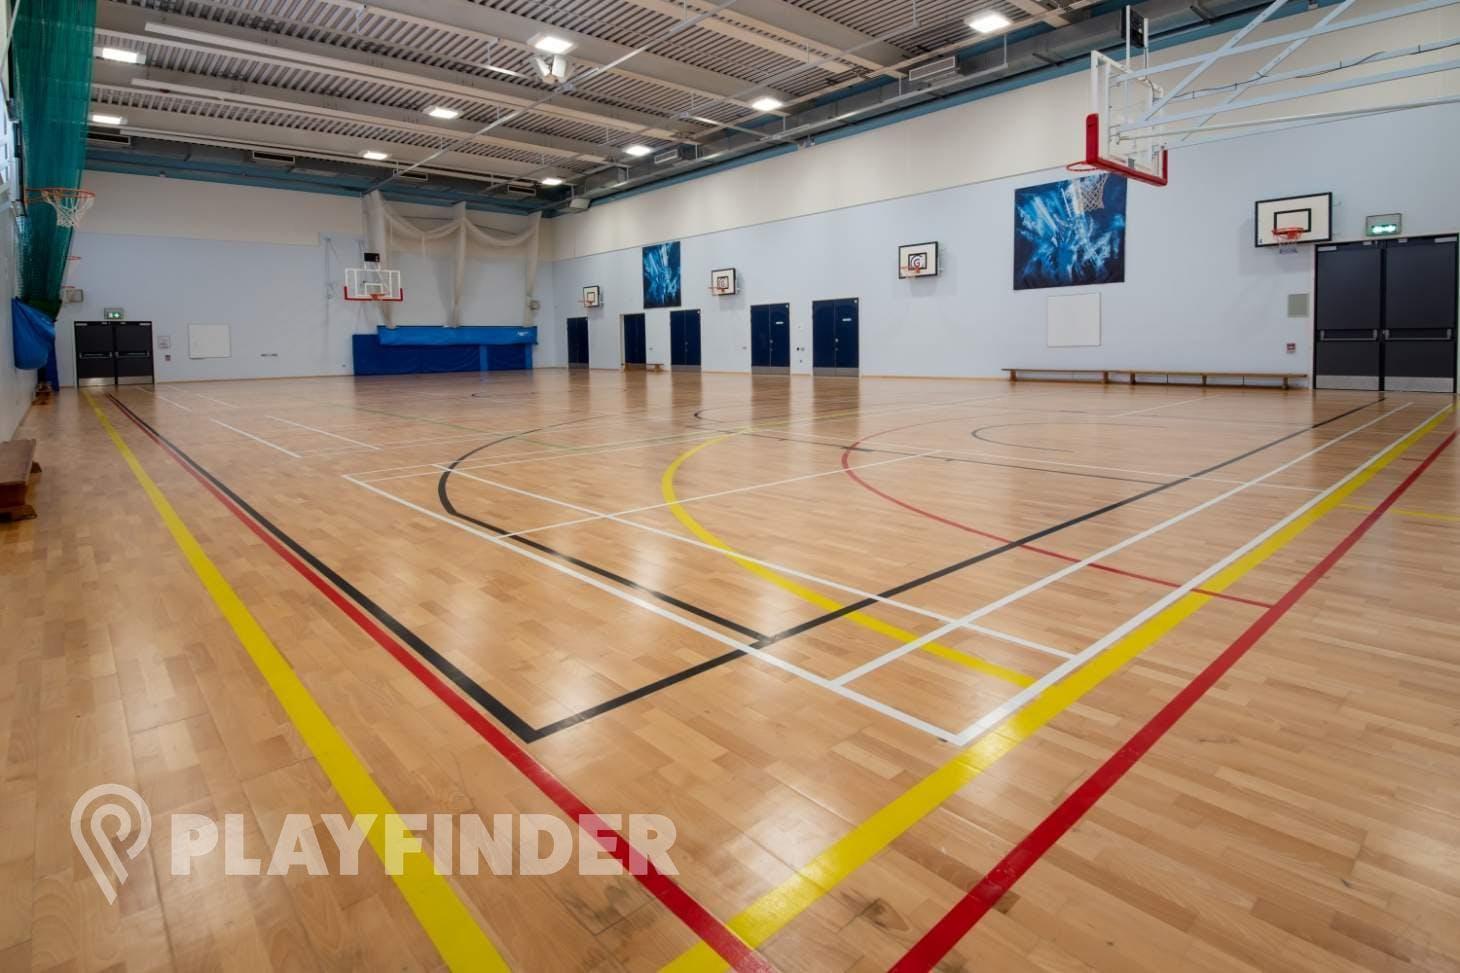 Harris Academy St Johns Wood Indoor netball court